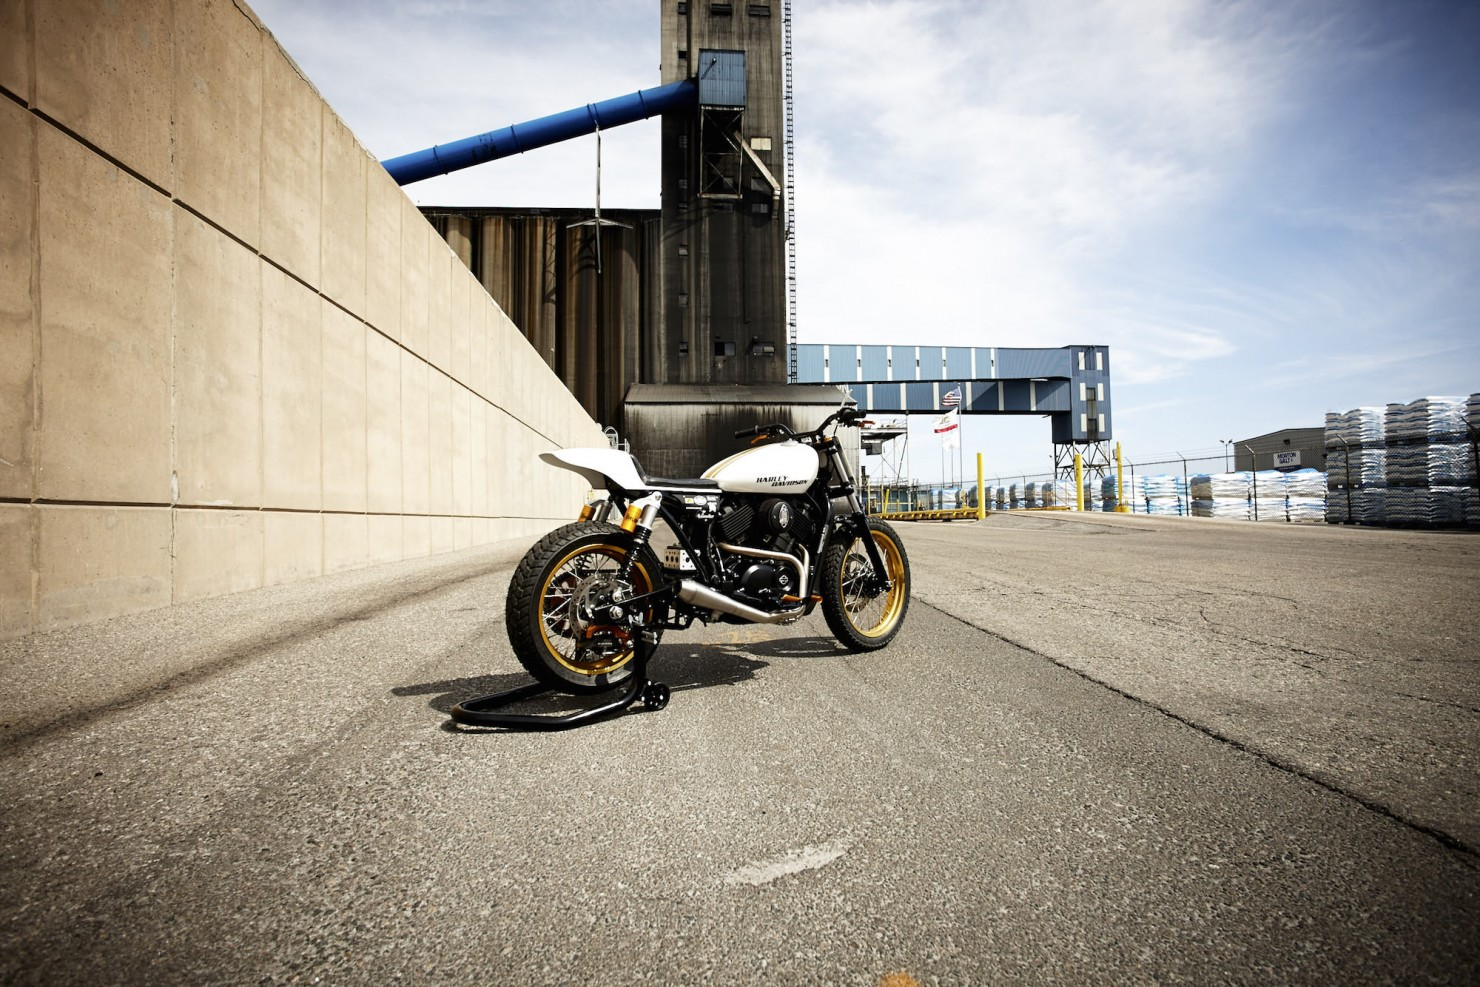 Harley_Davidson_Flat_Tracker_8